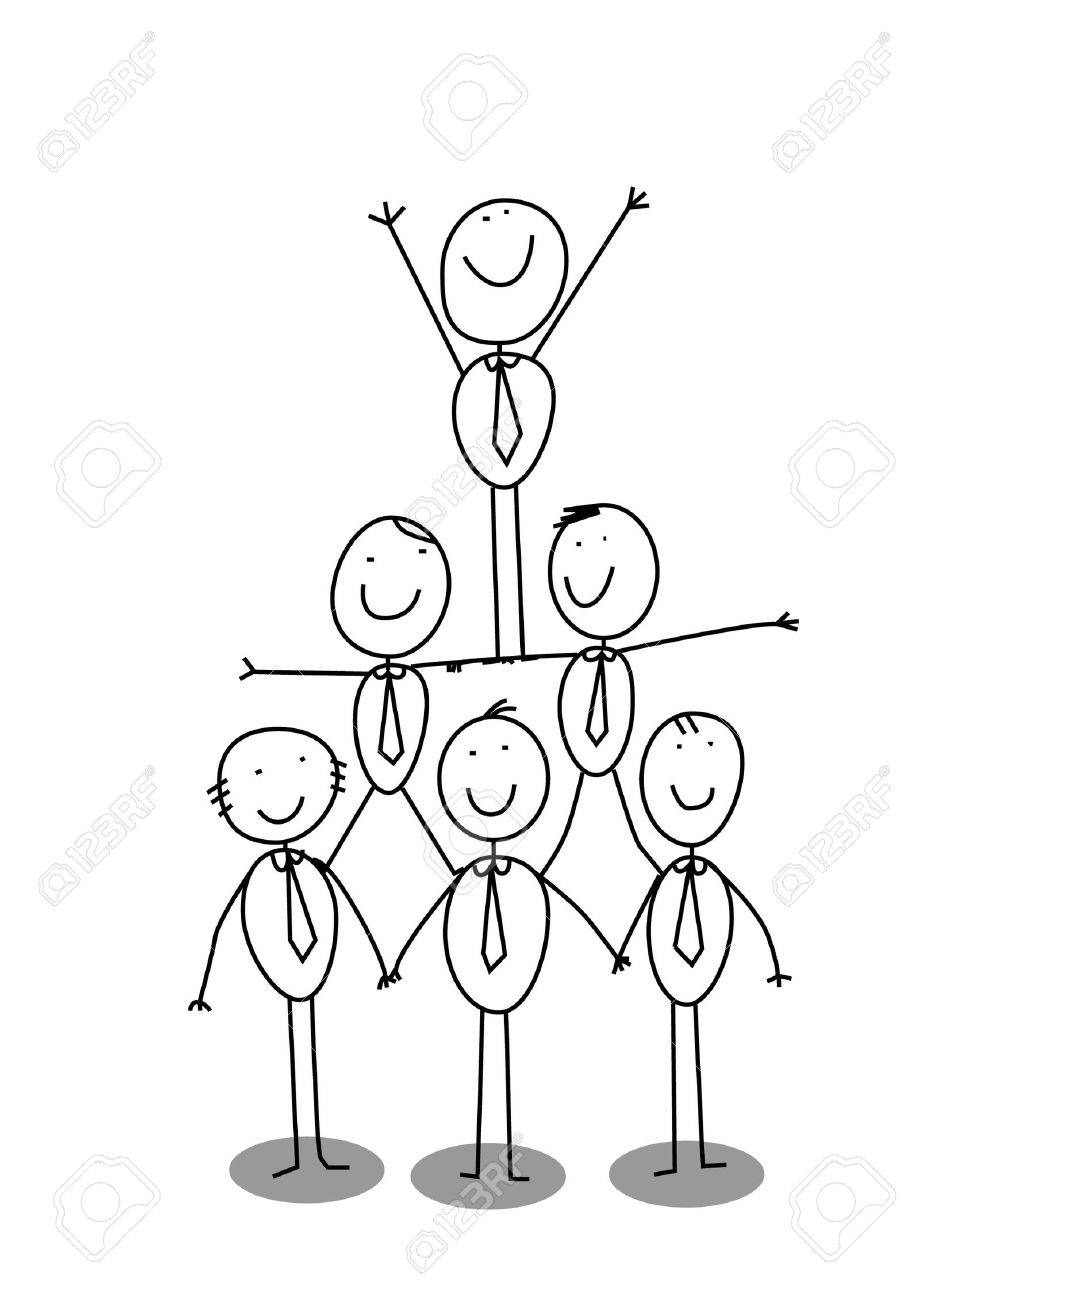 organitation chart teamwork - 11143506